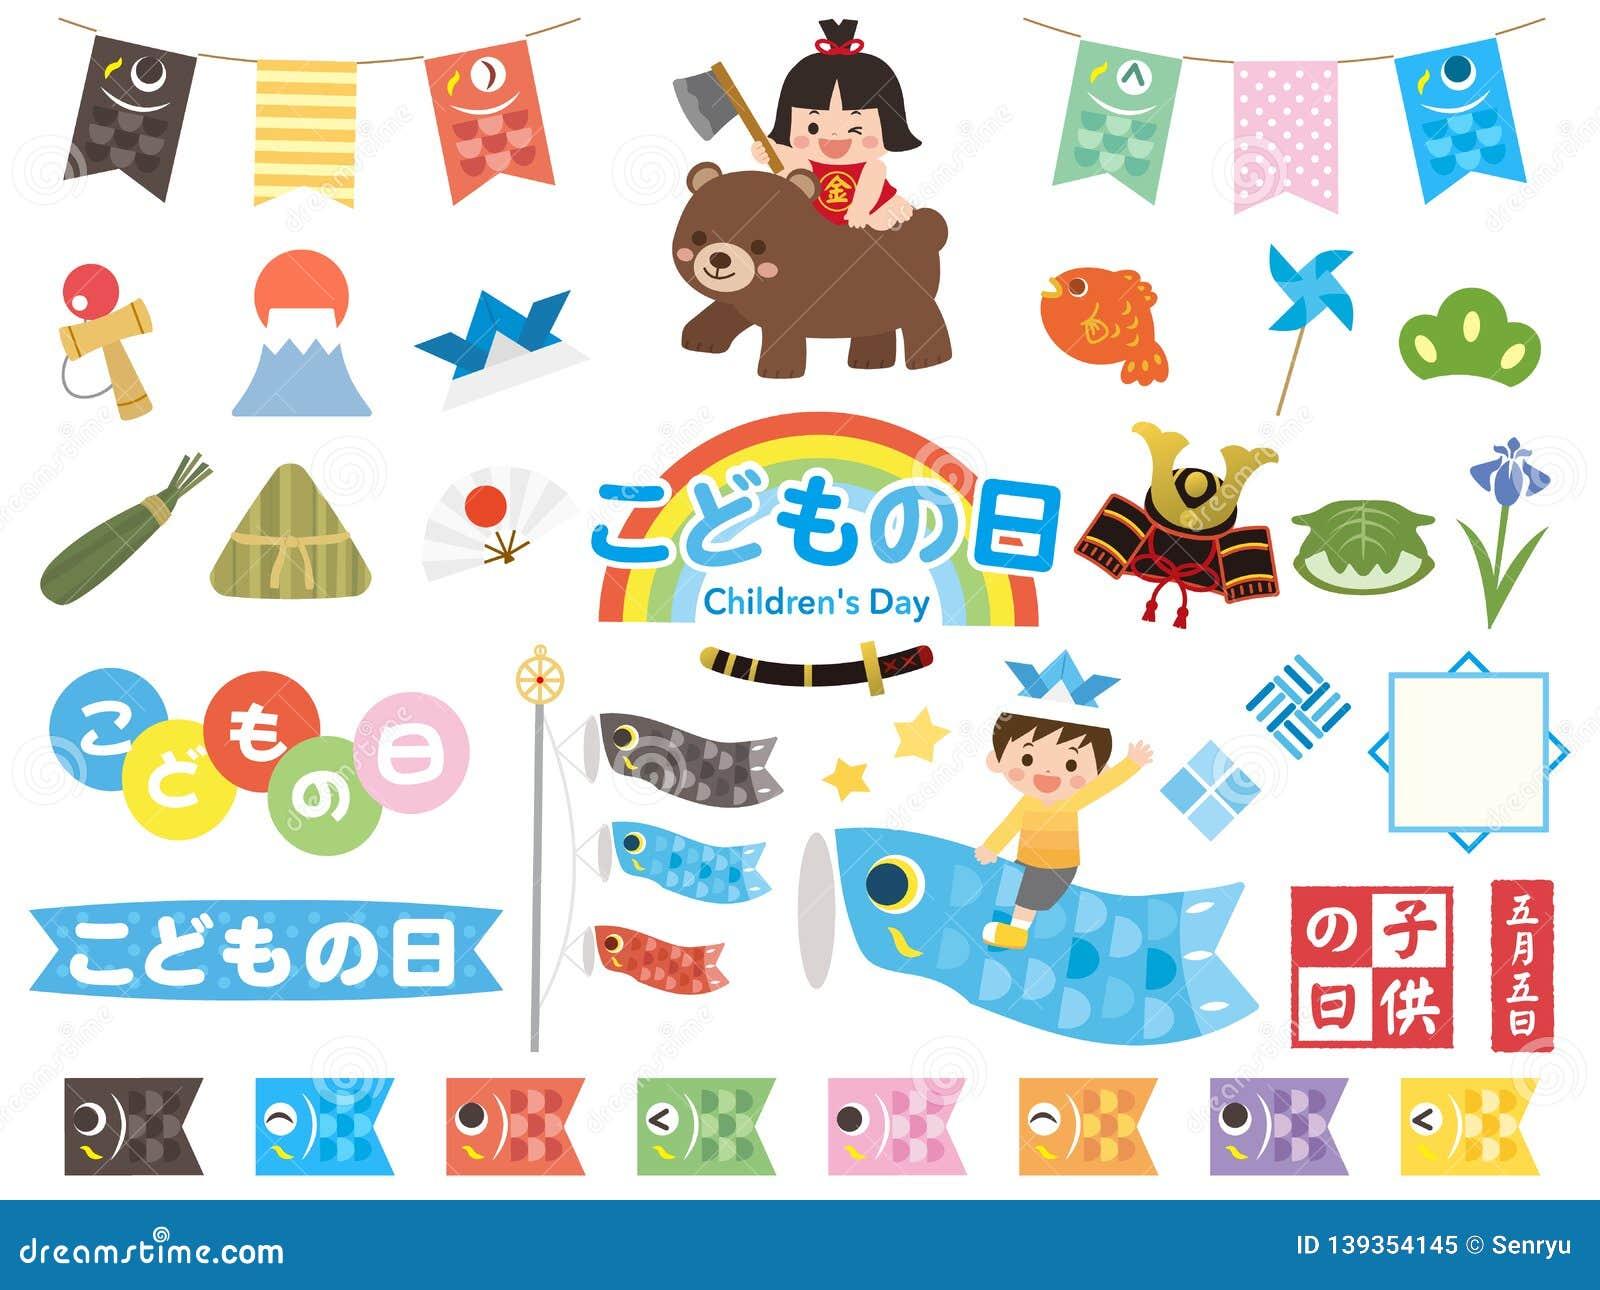 Koinobori (carp streamer). Fish Kites. Traditional japanese Celebrating Children's  Day. - Buy this stock vector and explore similar vectors at Adobe Stock    Adobe Stock